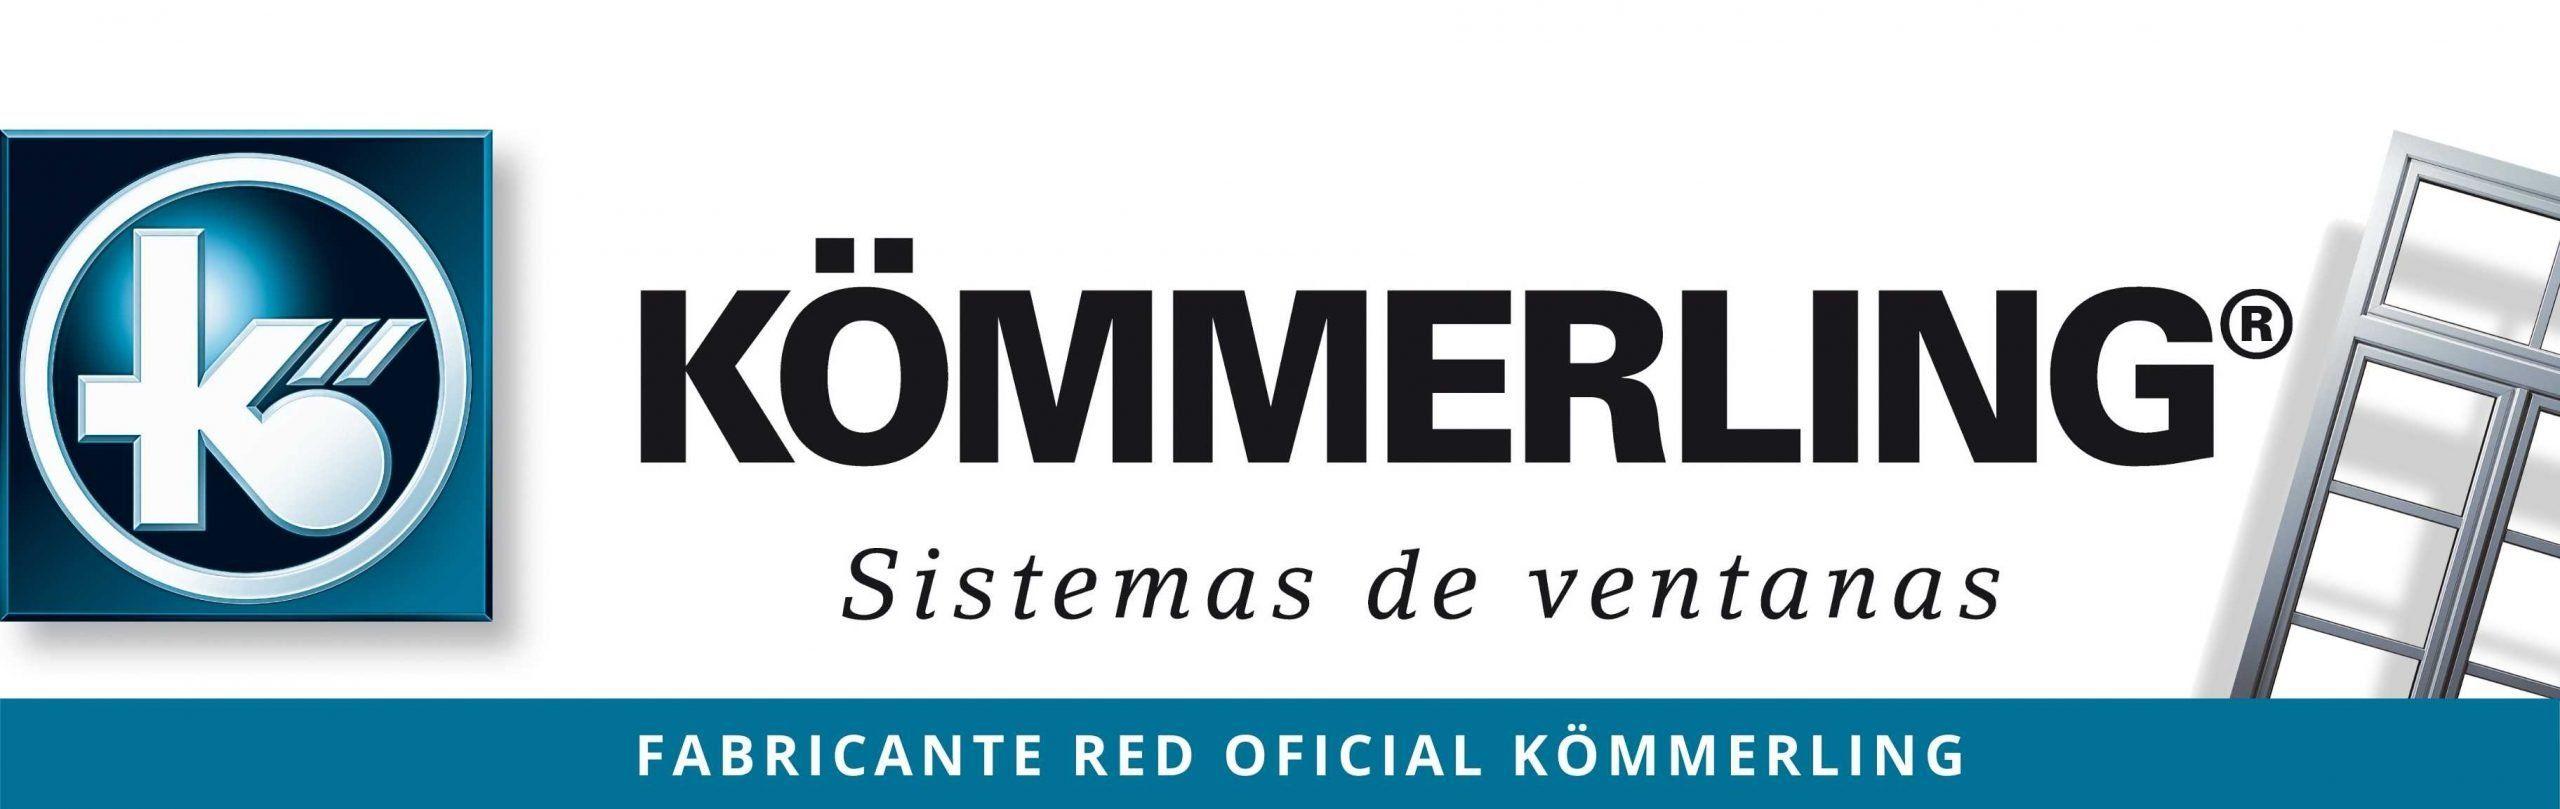 Ventanas de PVC Kömmerling en Madrid